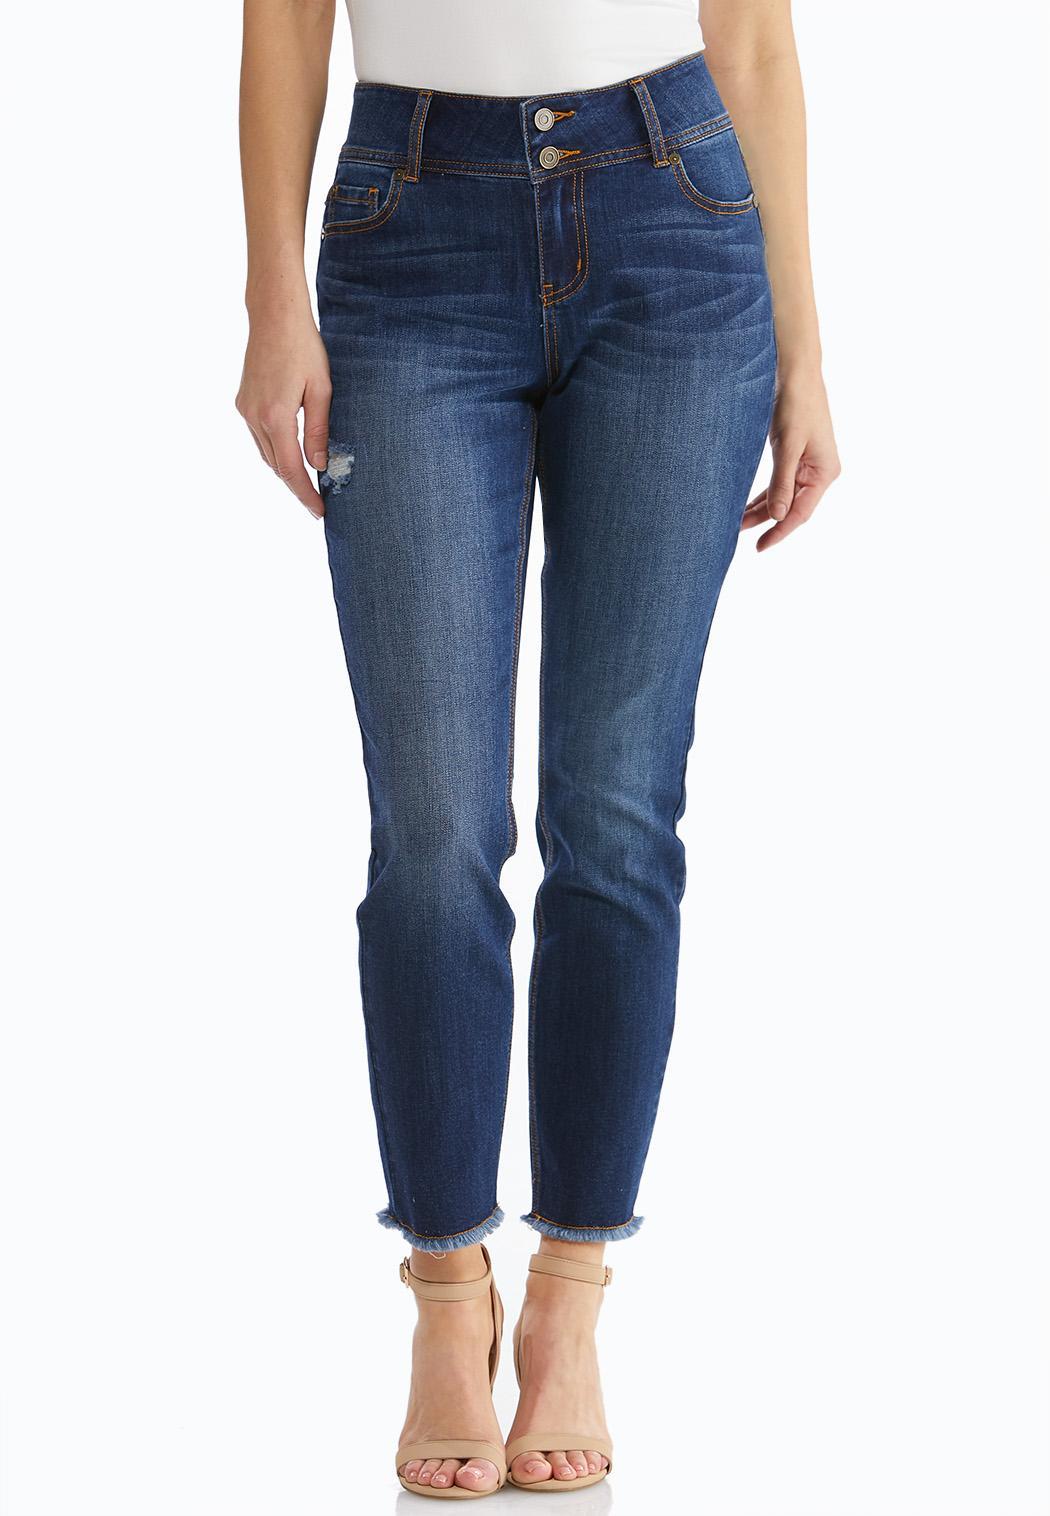 Distressed Fringe Hem Jeans